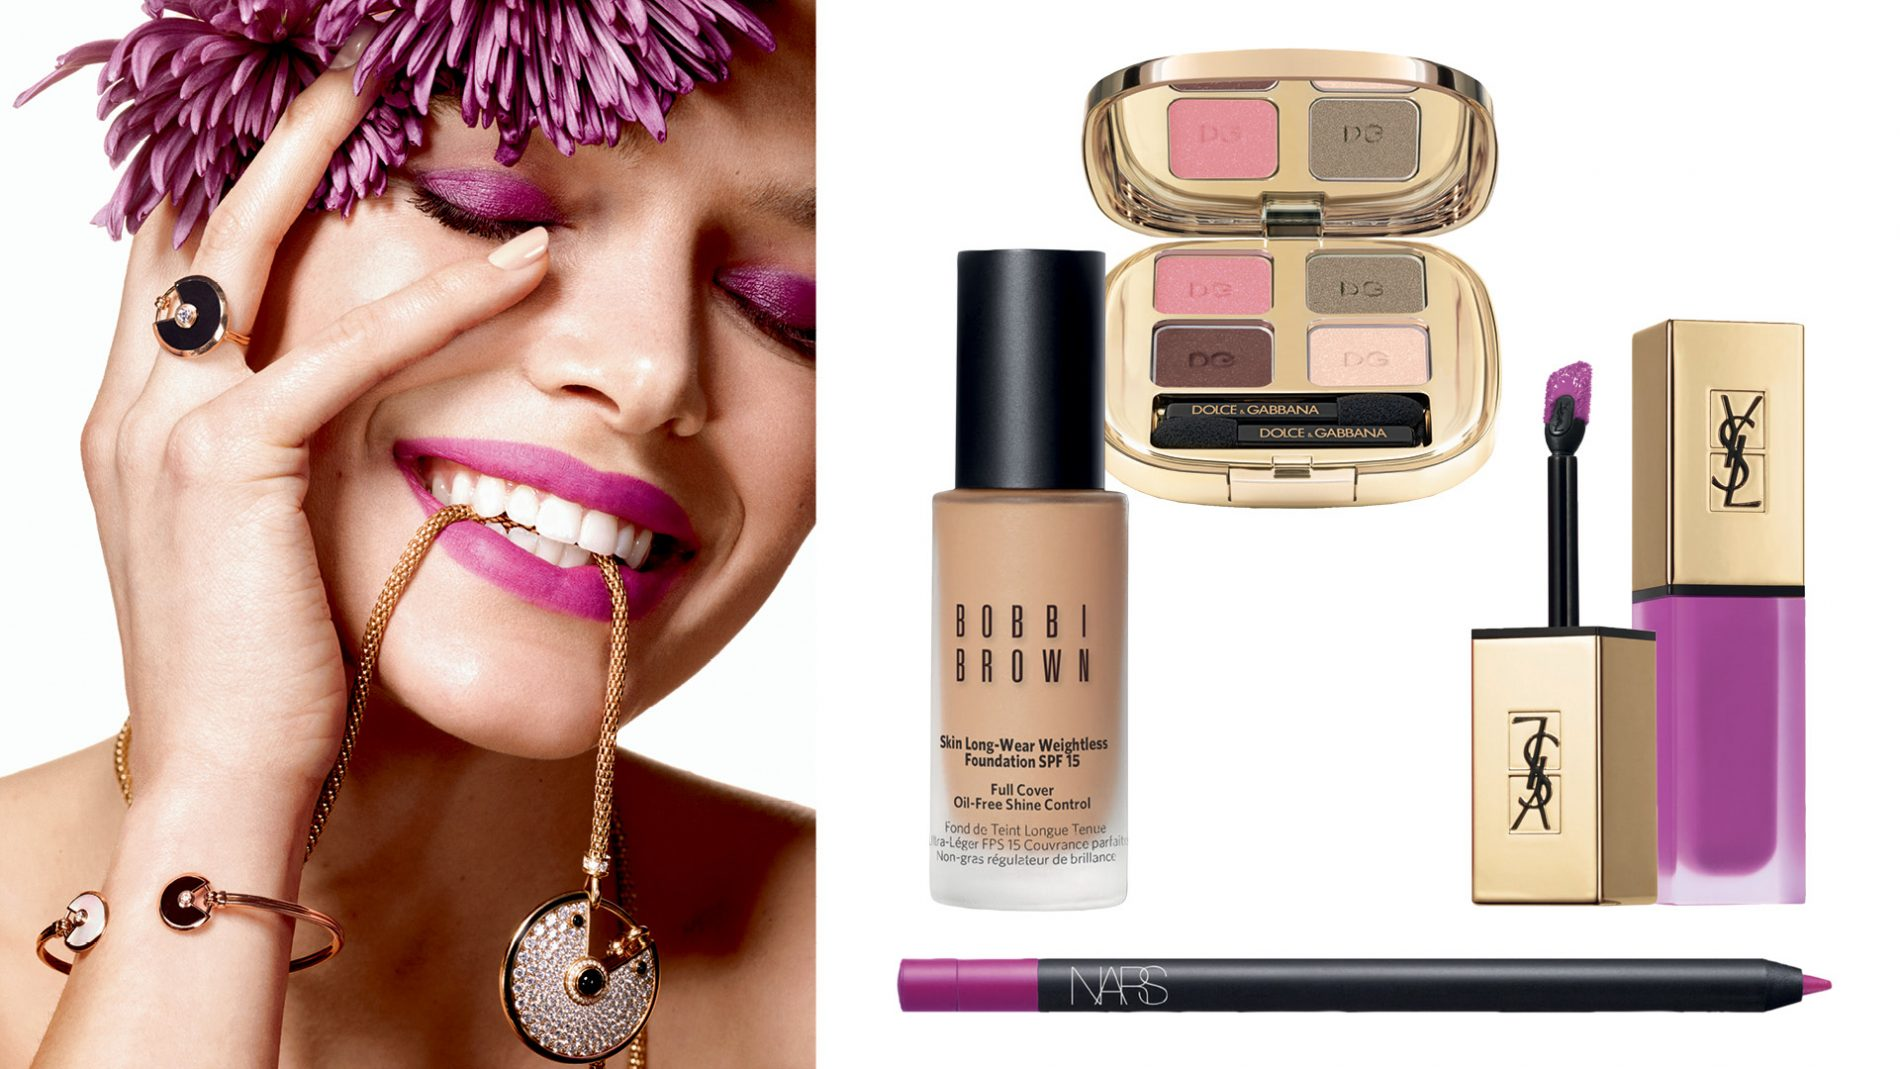 El Corte Inglés Beauty Makeup Jewelry Cartier Dolce & Gabbana YSL Nars Bobbi Brown